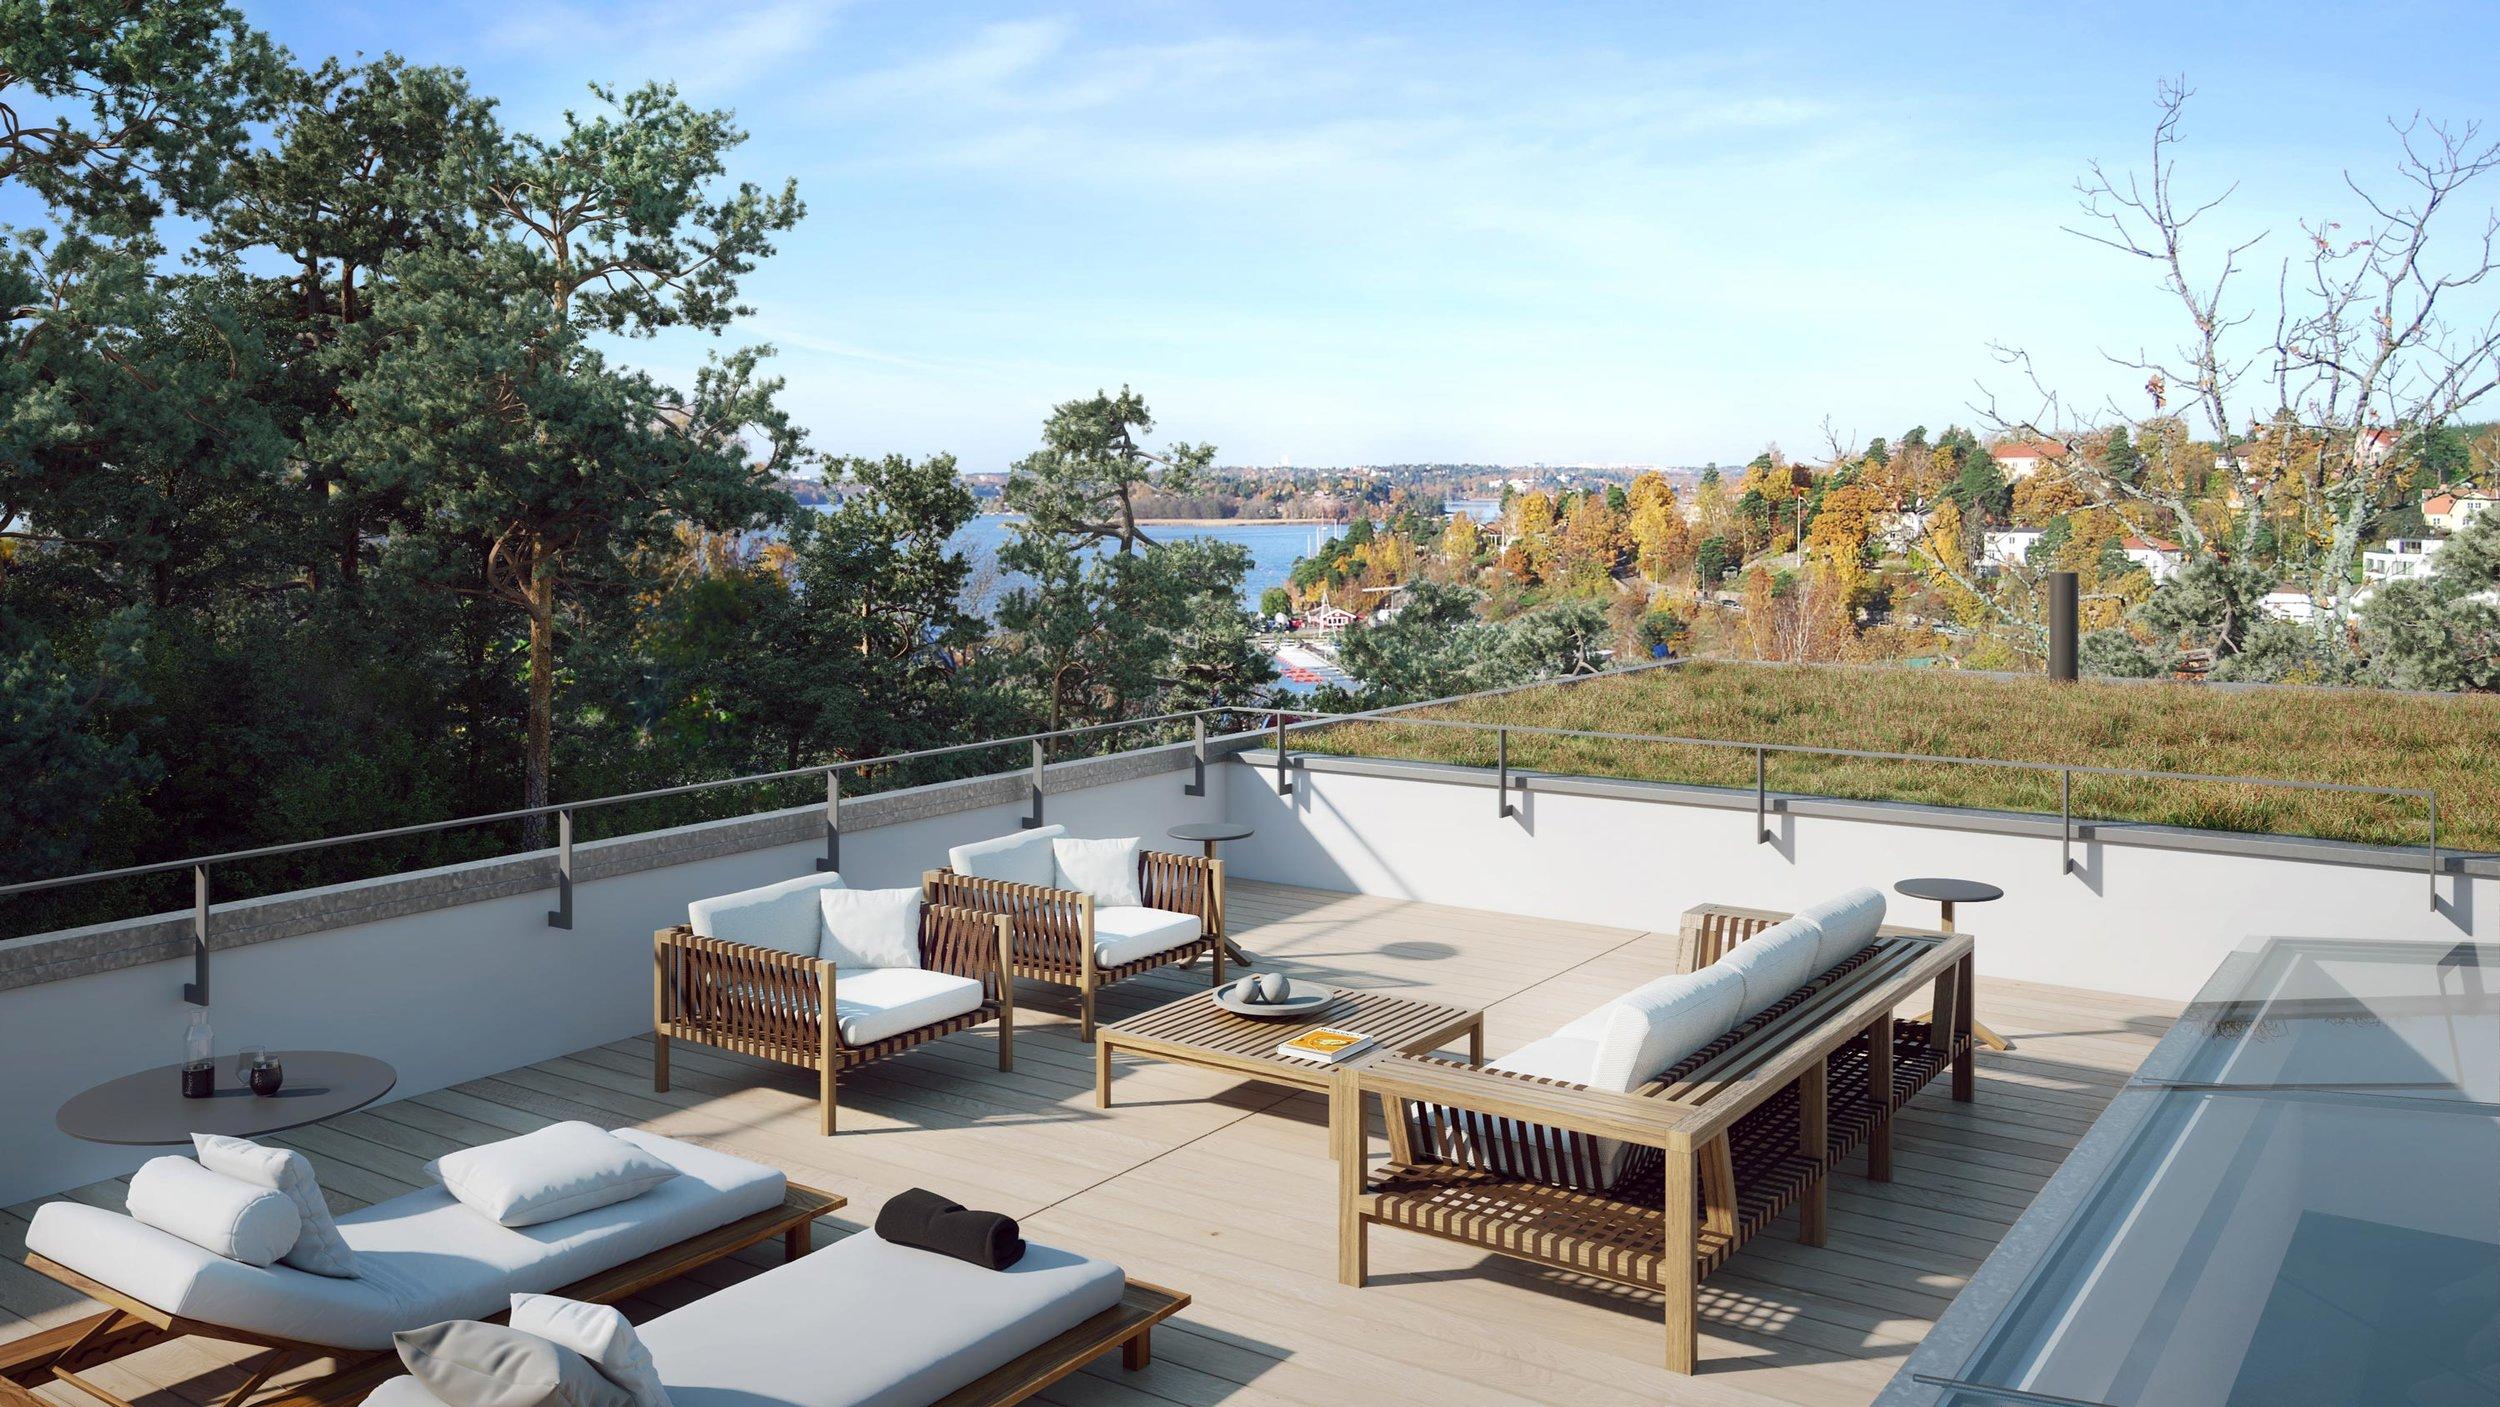 pyrus luxury villas, strom architects, imola, 6.jpg